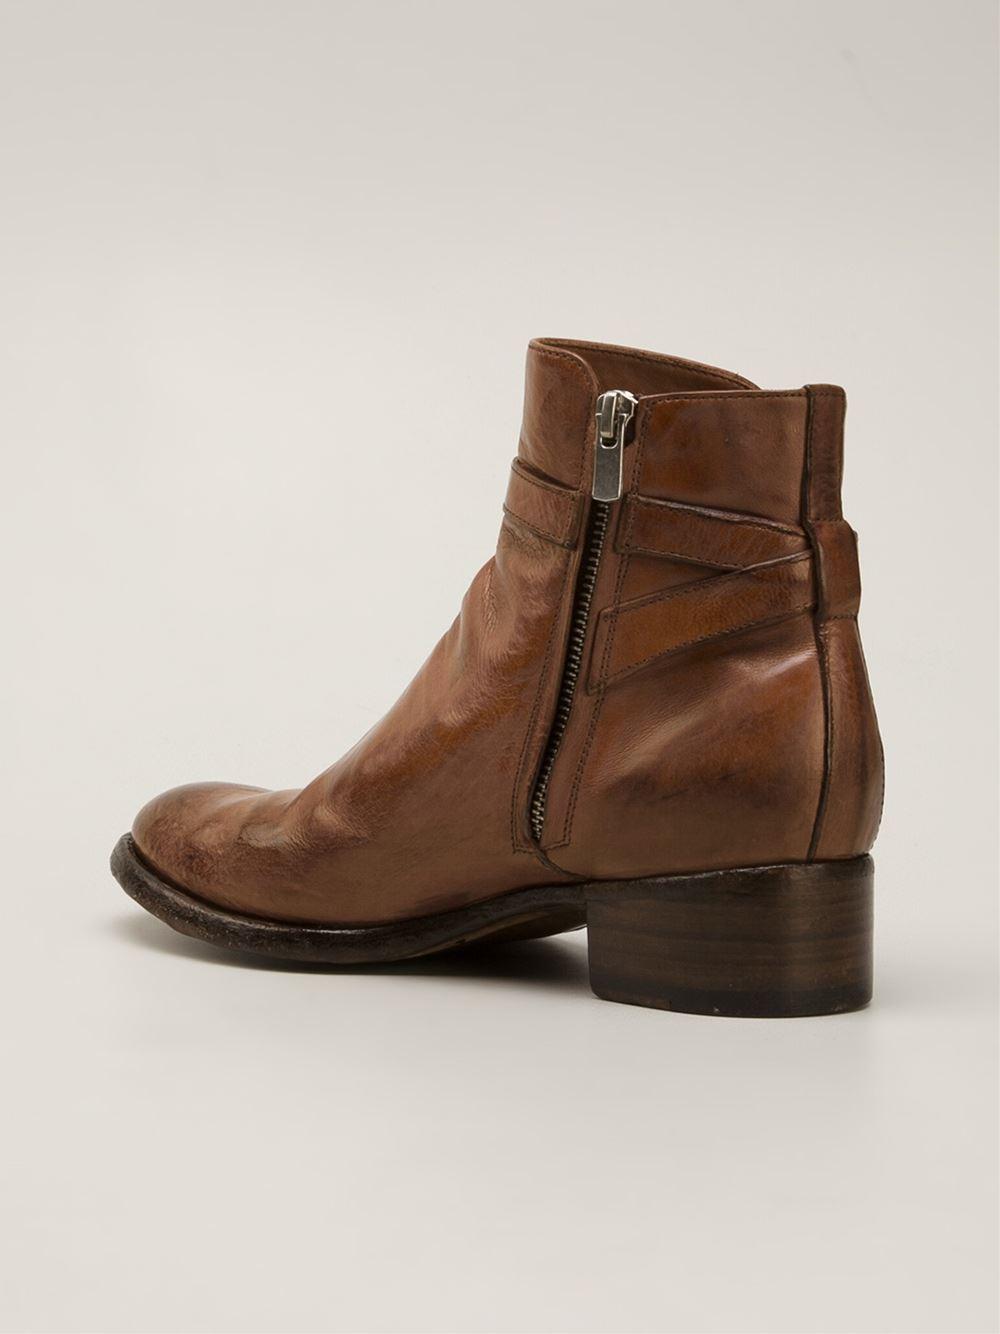 Elegant Officine Creative Womenu2019s U2018Lenahu2019 Boots U2013 Aallshoestyle